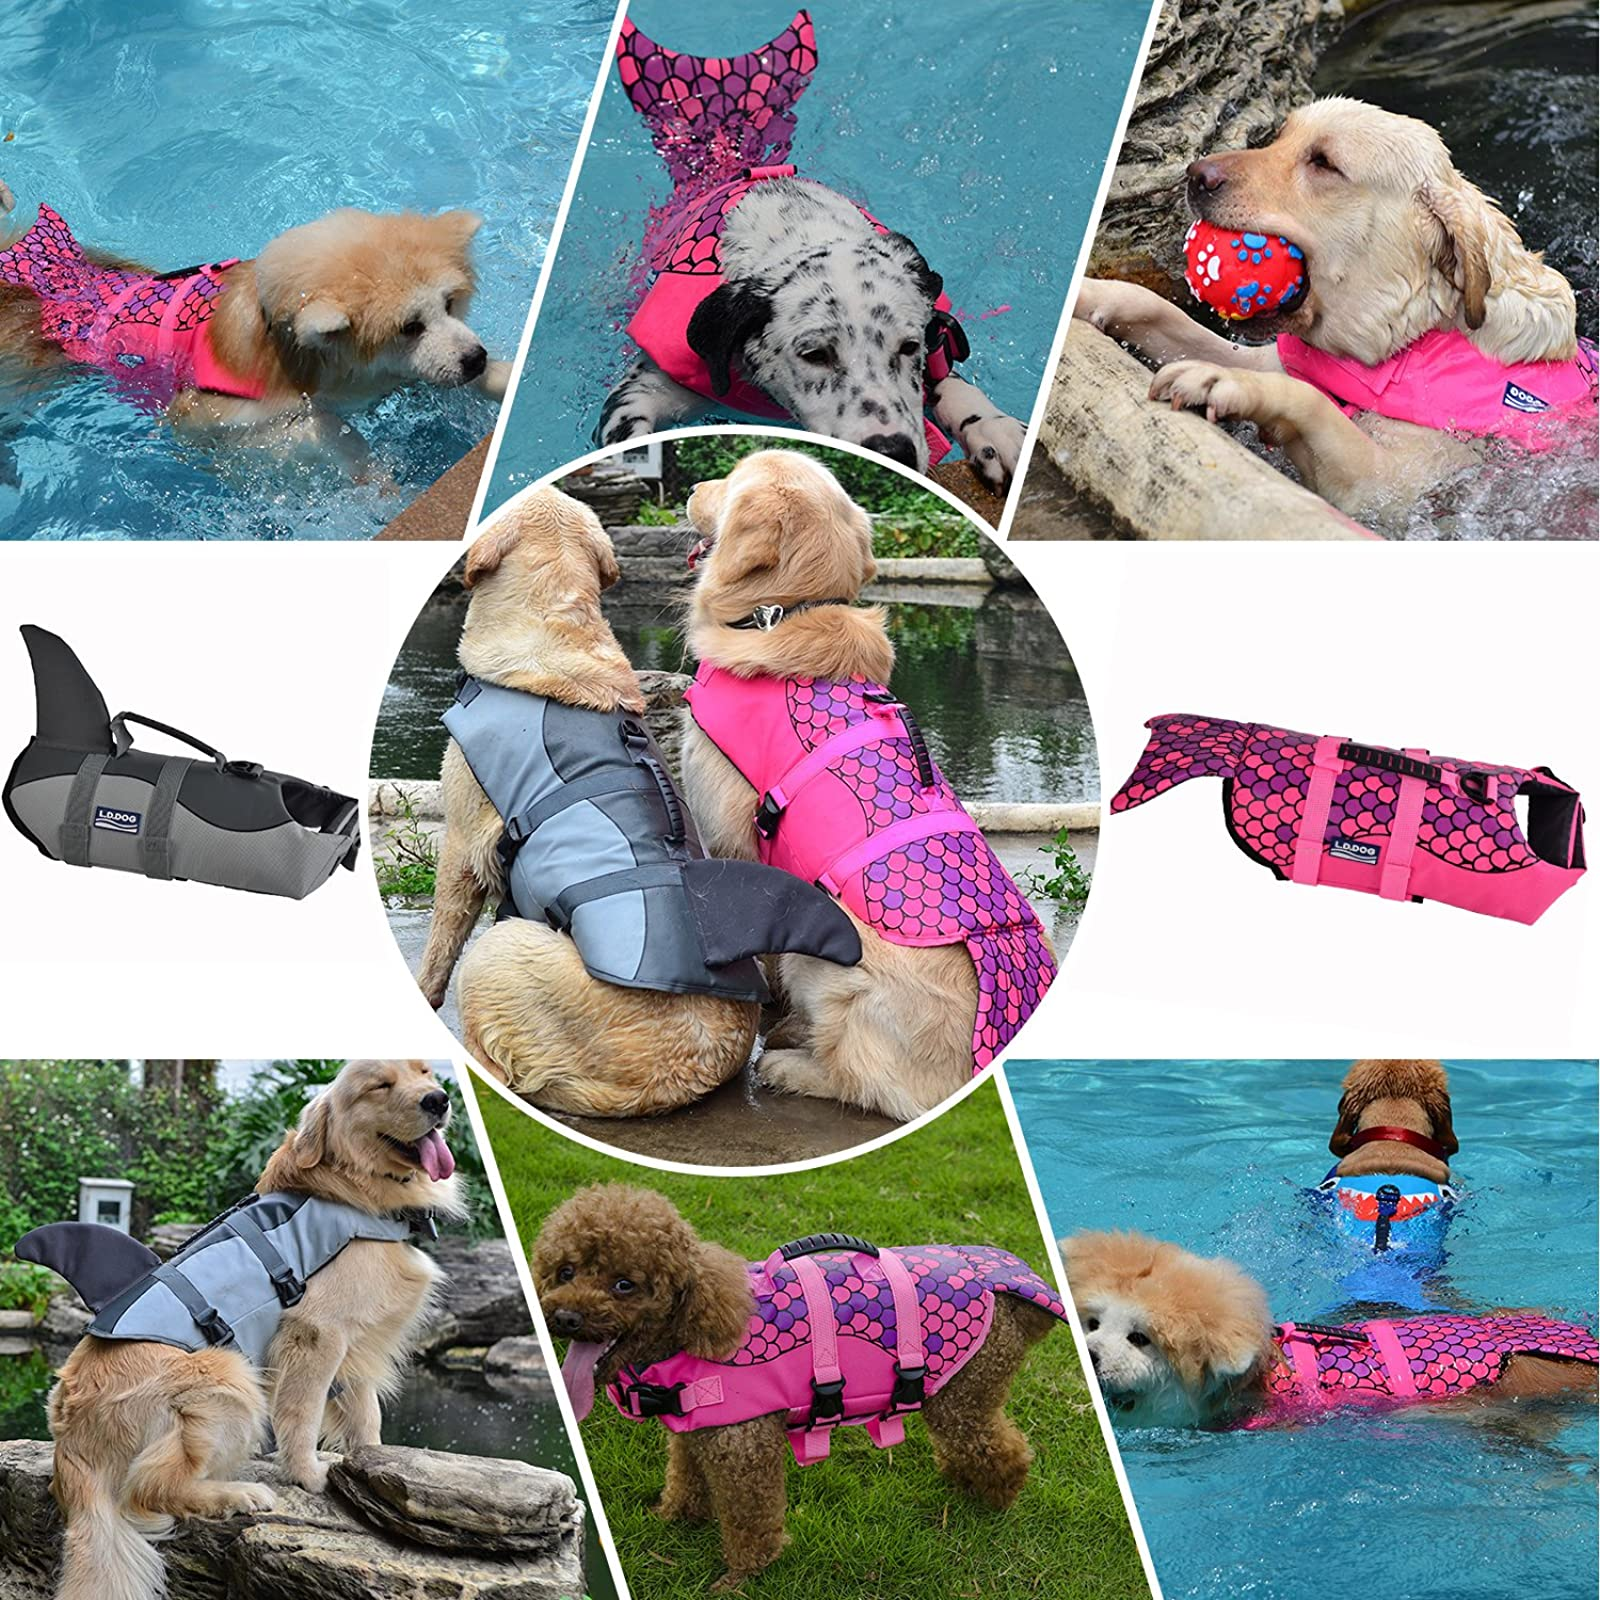 Queenmore Dog Life Jacket Ripstop Lifesaver Coat - 8